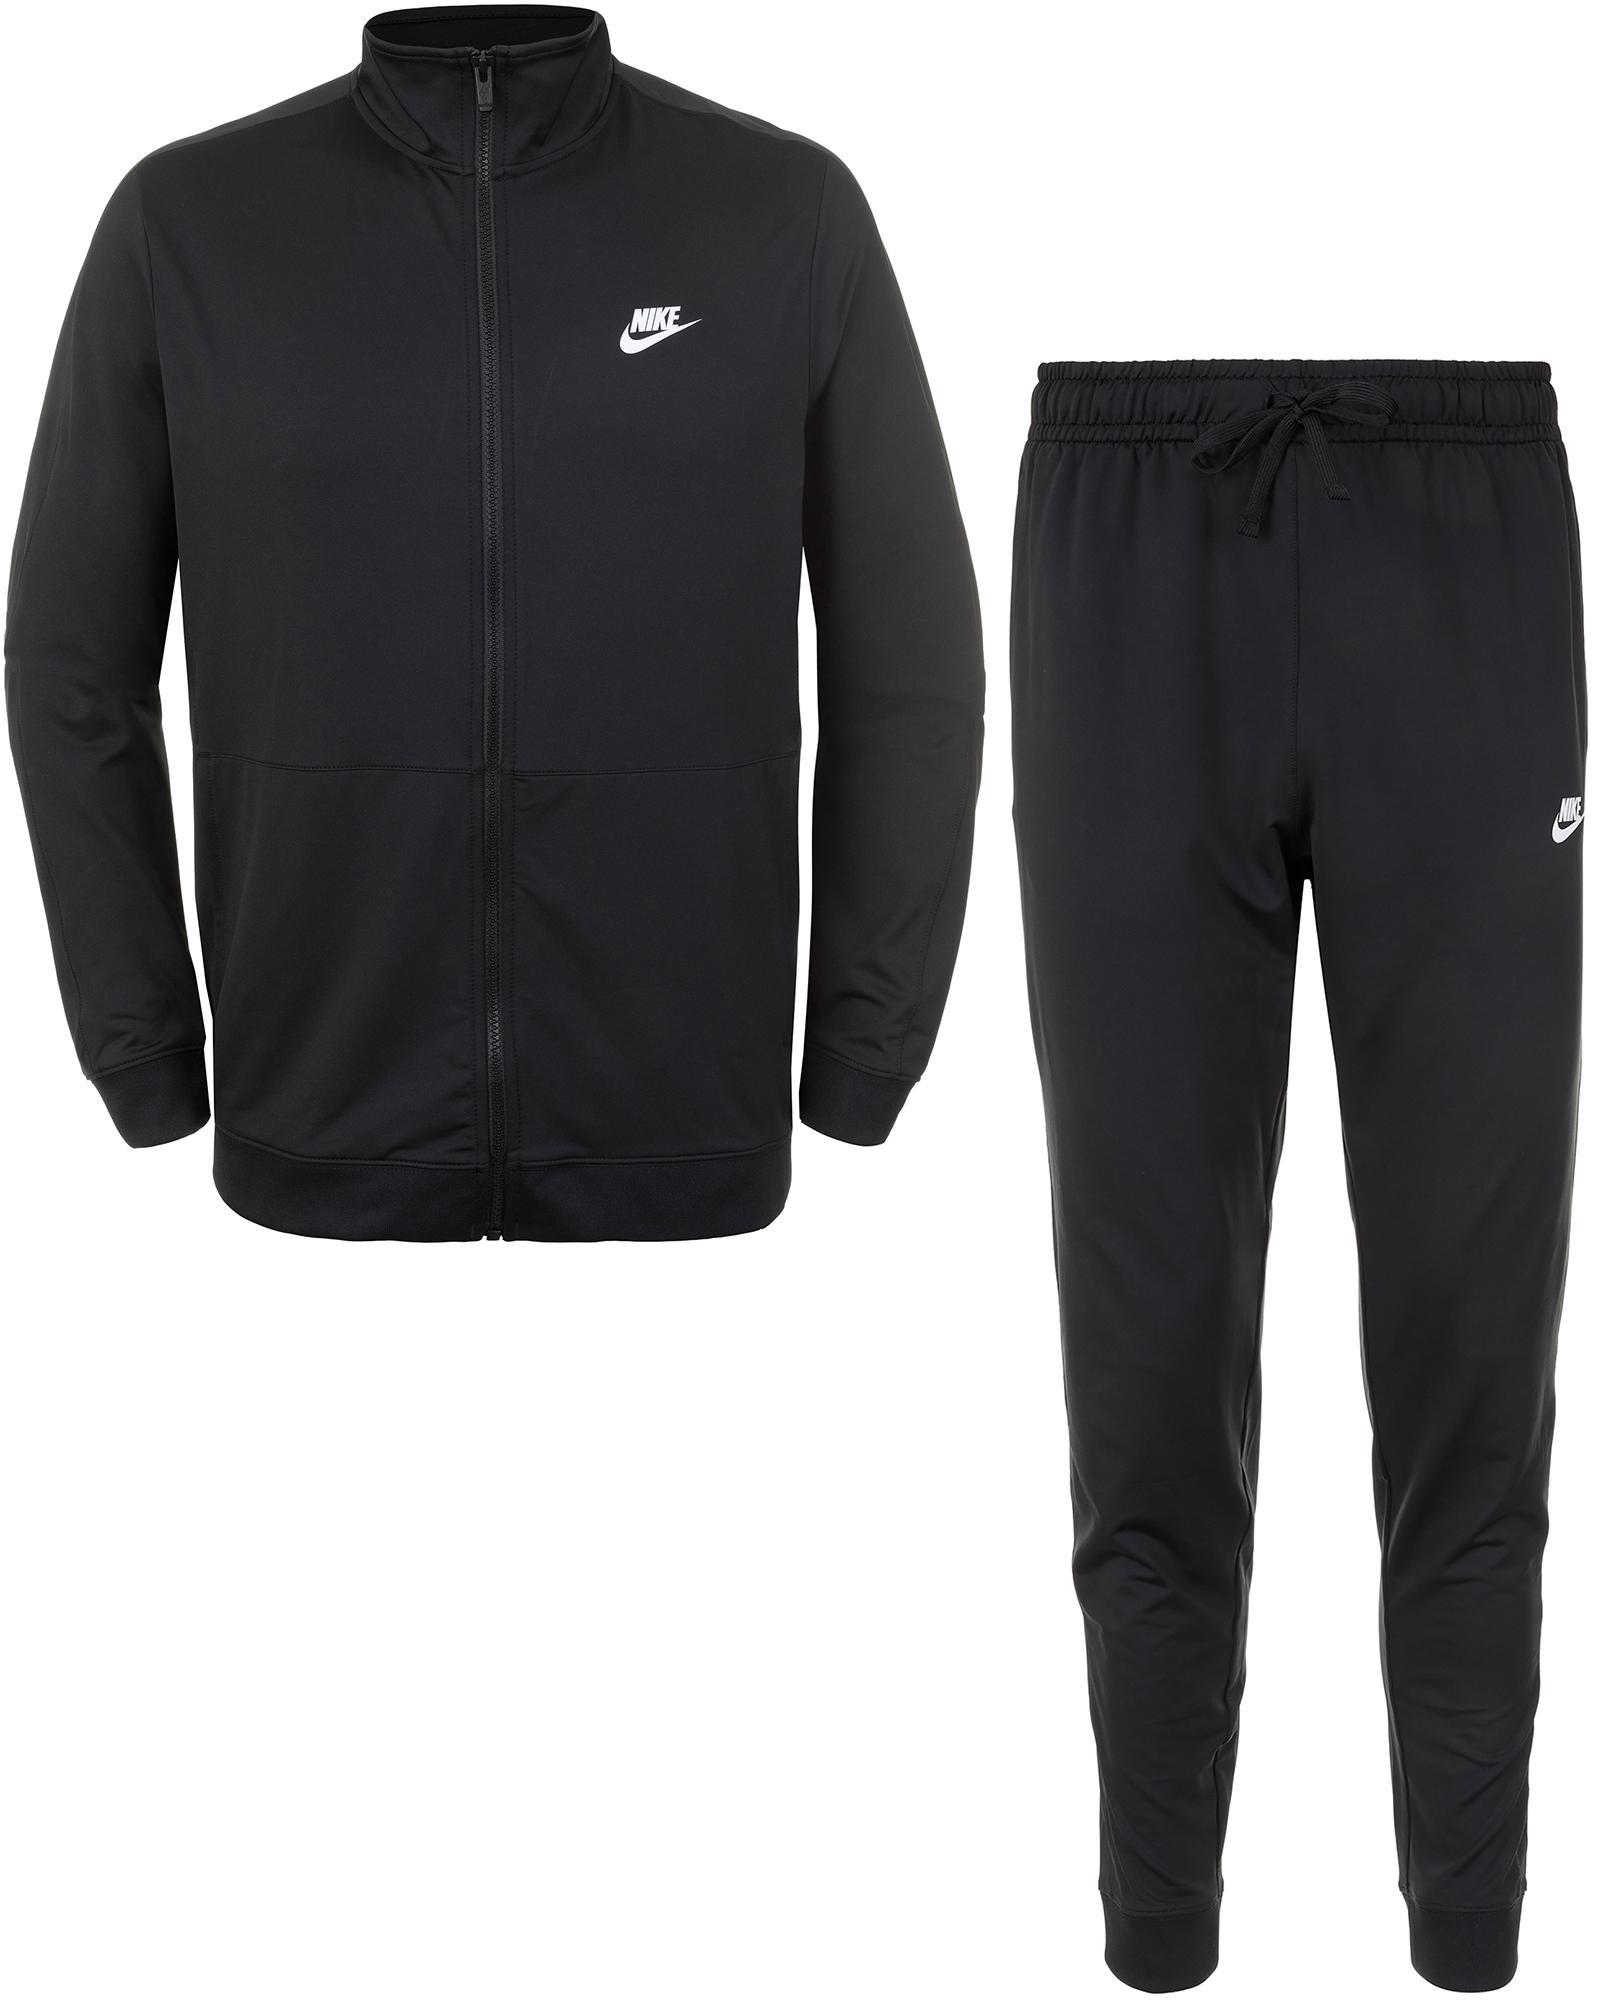 Nike Костюм спортивный мужской Nike Sportswear, размер 54-56 nike костюм спортивный для мальчиков nike sportswear